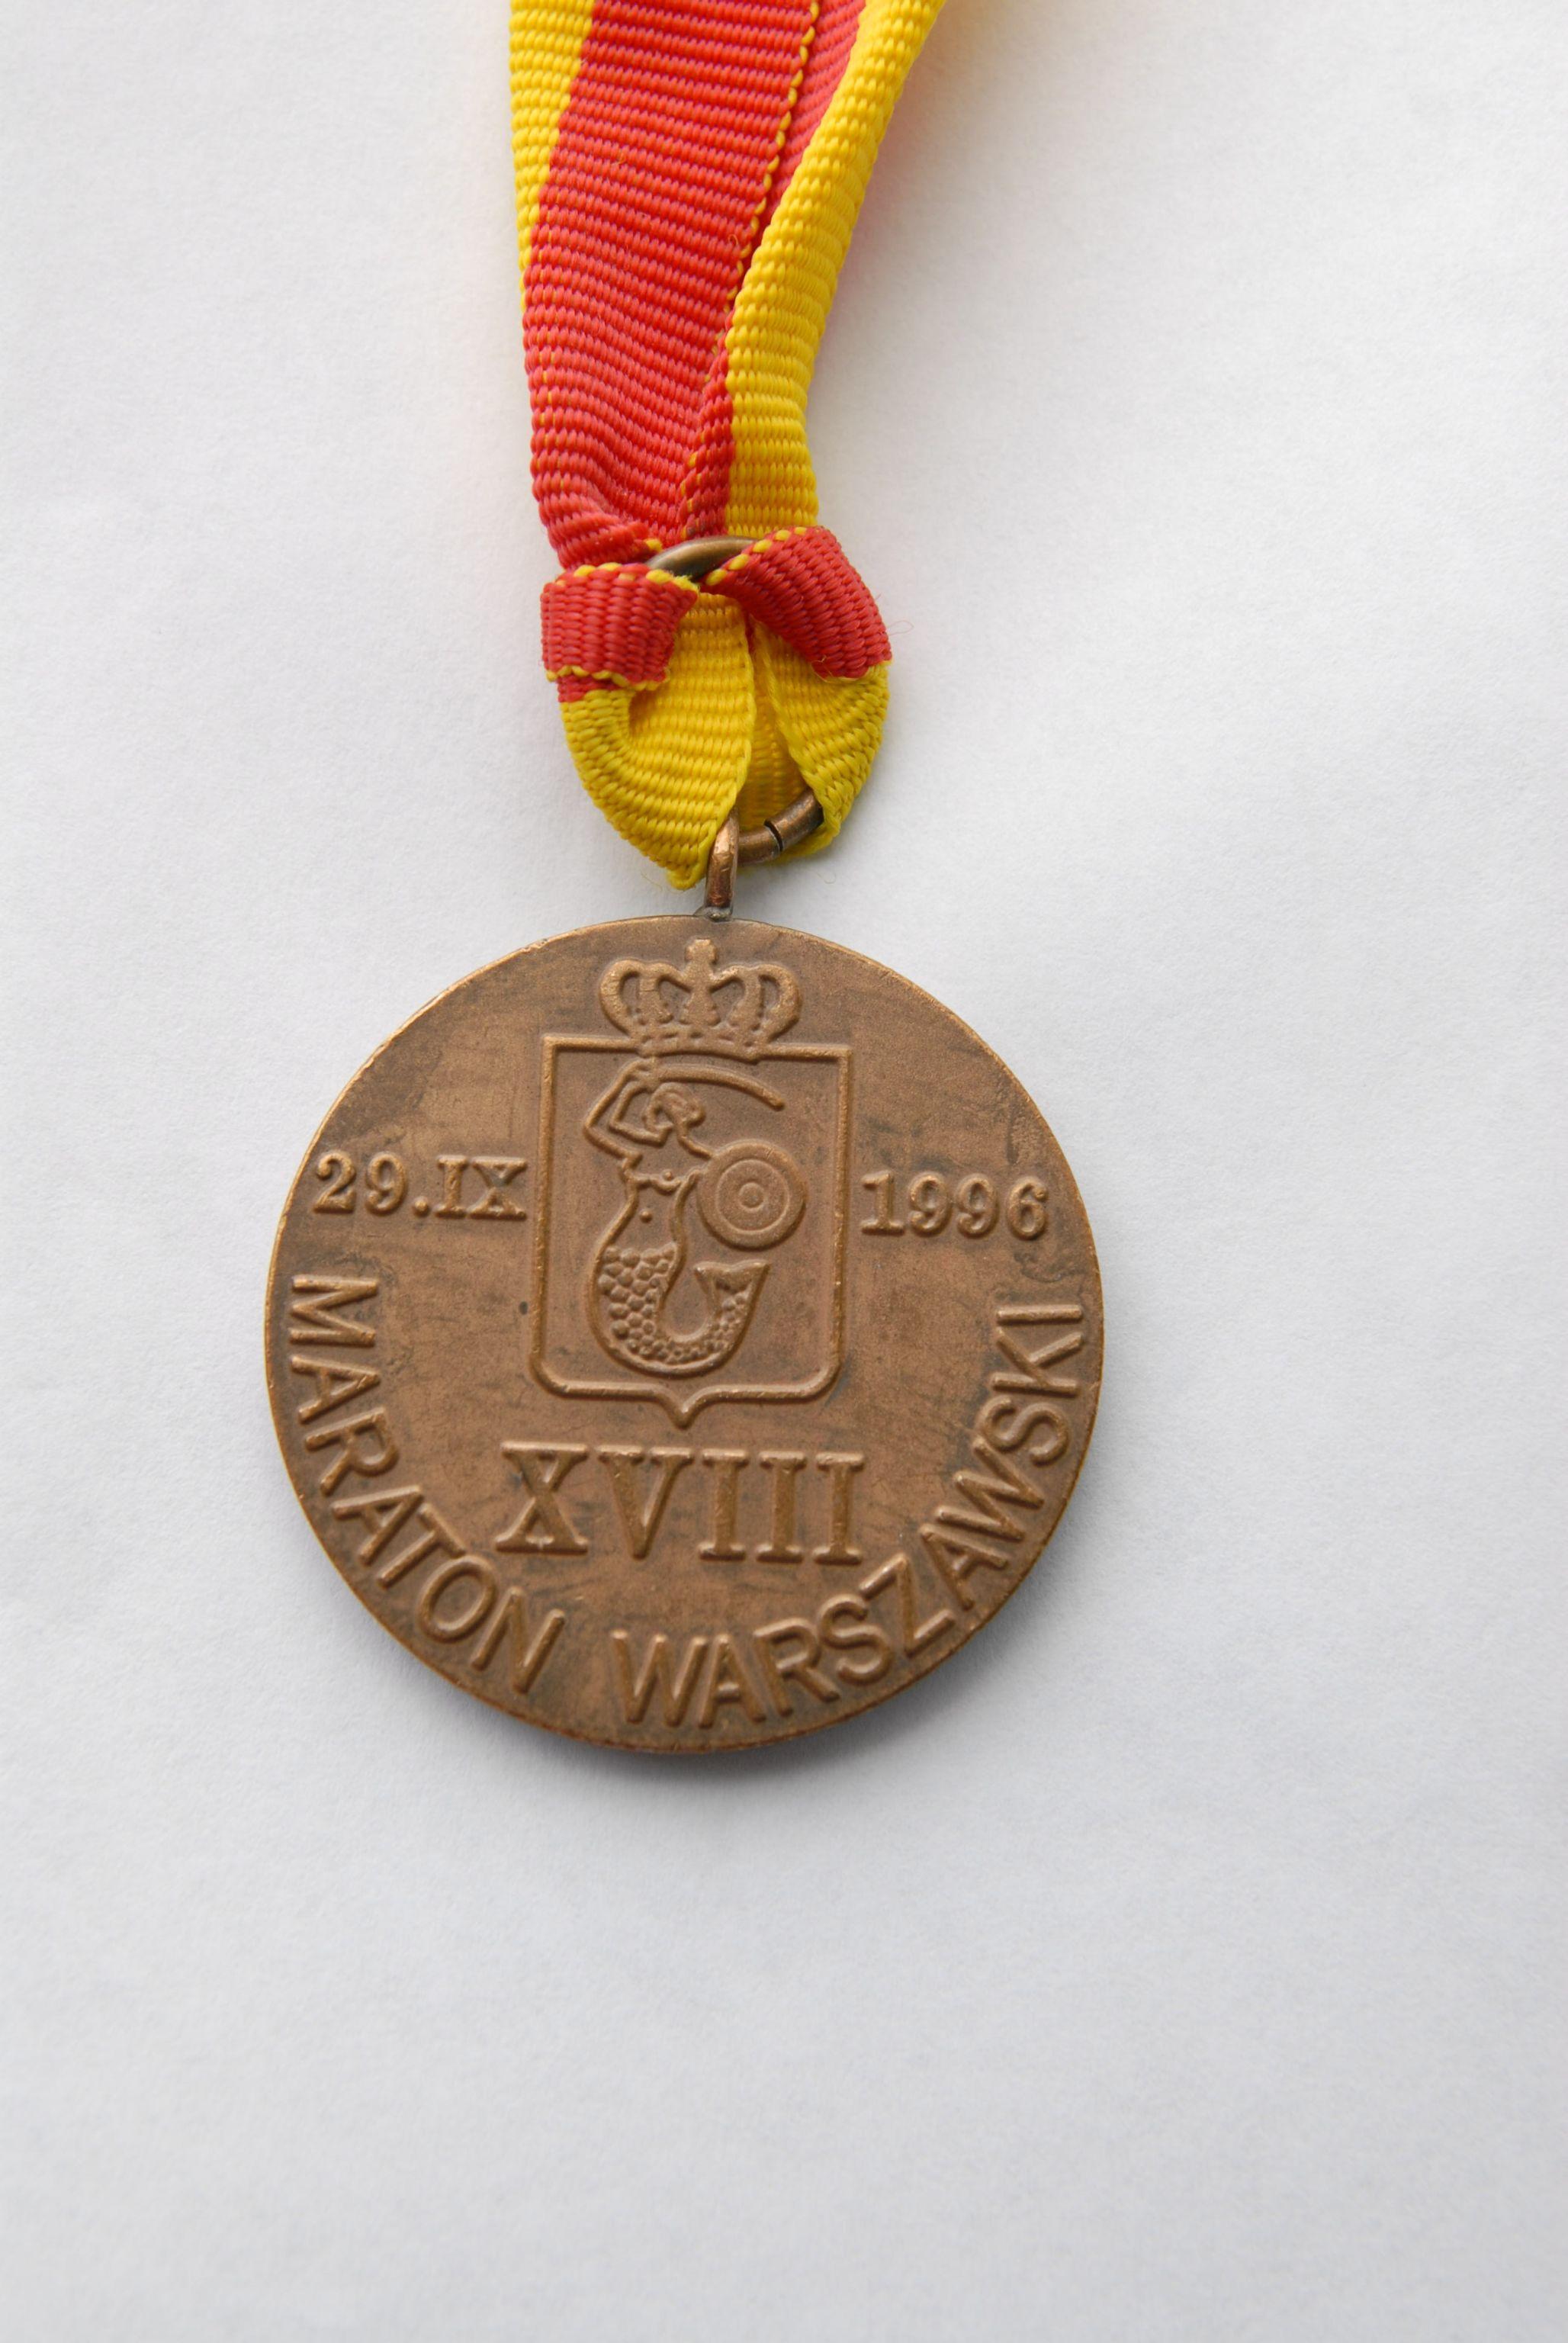 1996-medal-18-maraton-resize